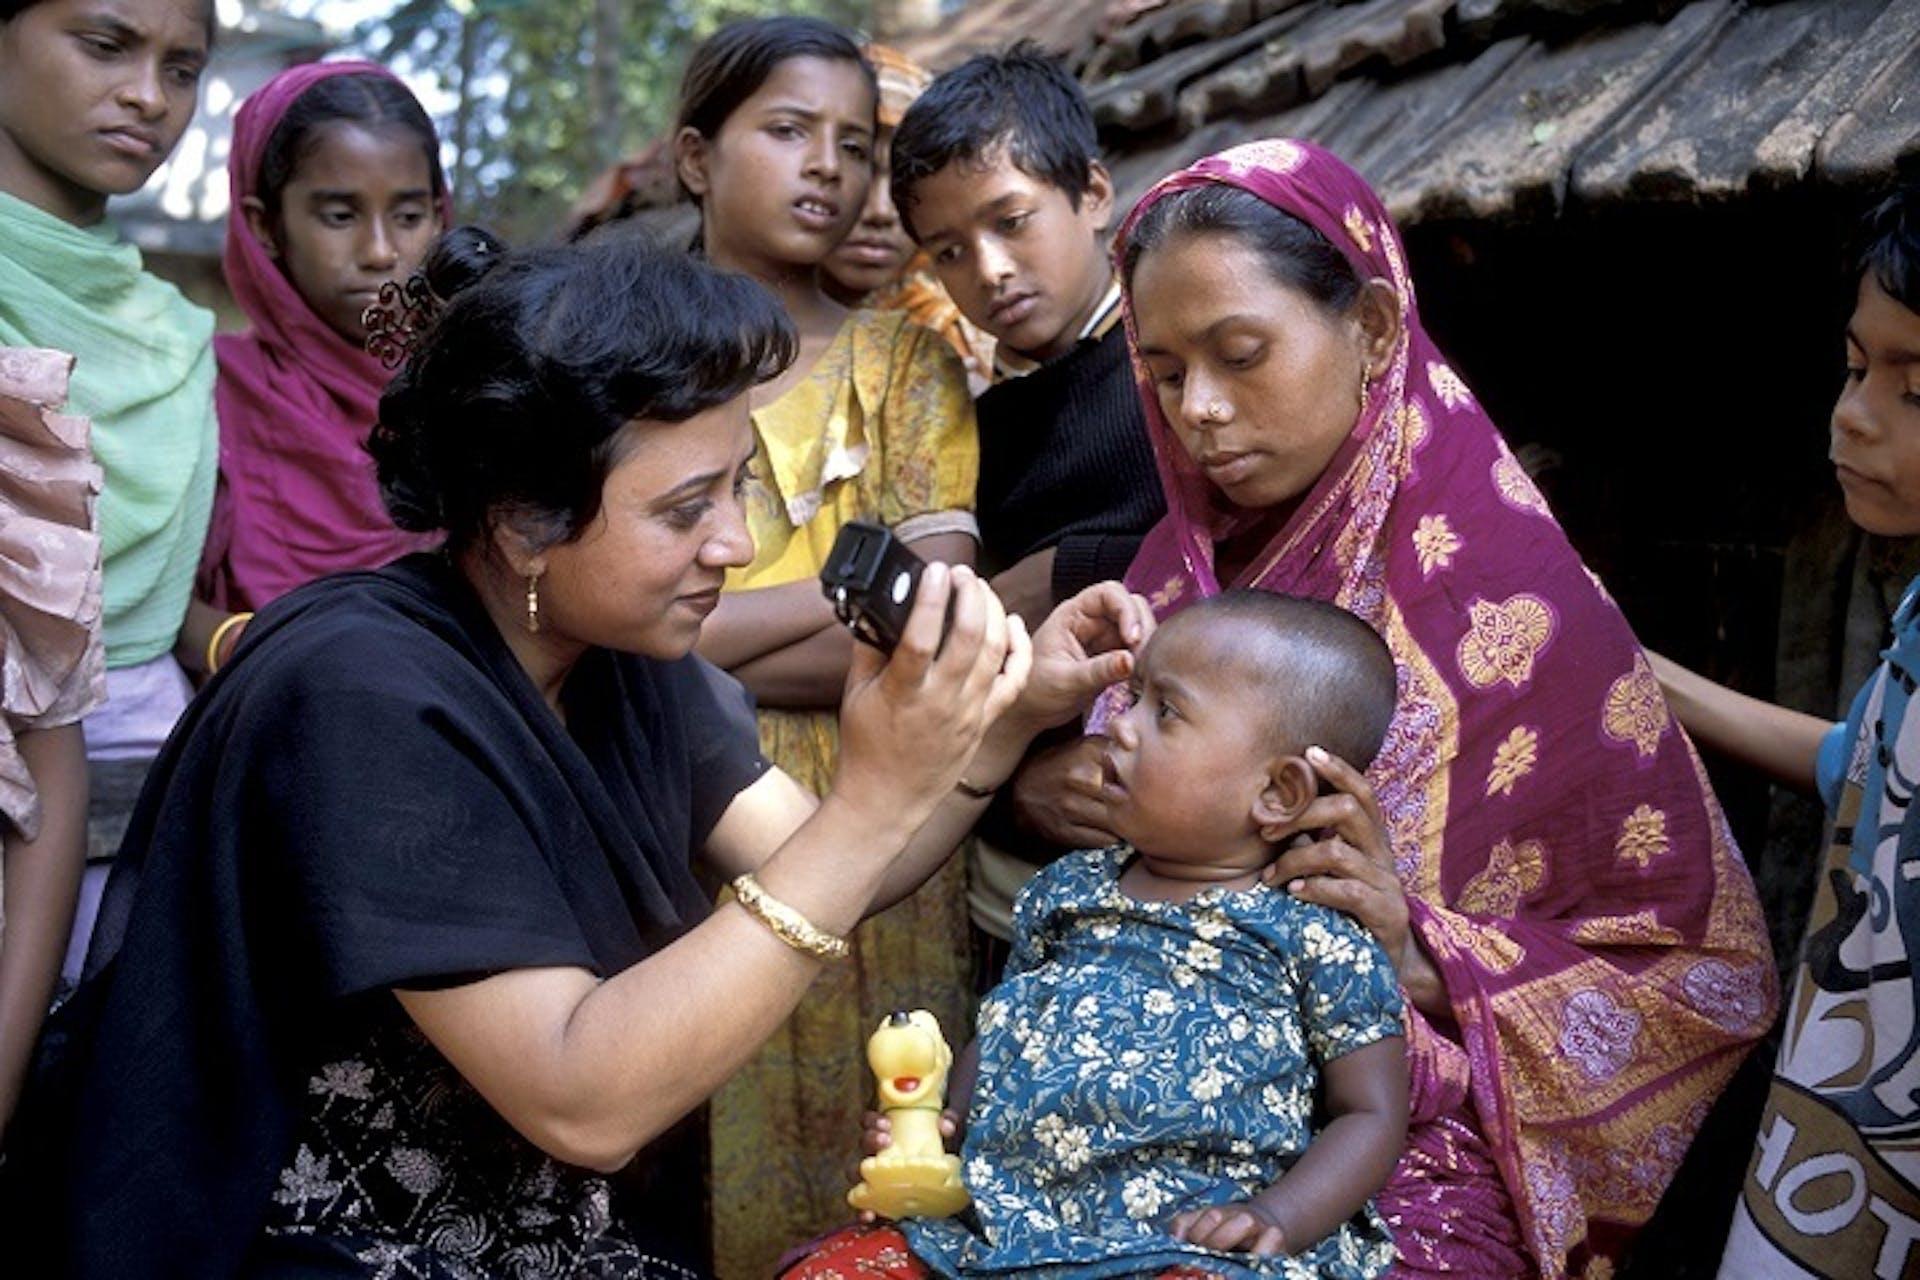 Bangladeshi paediatric patient Afioza Yazim gets an eye examination